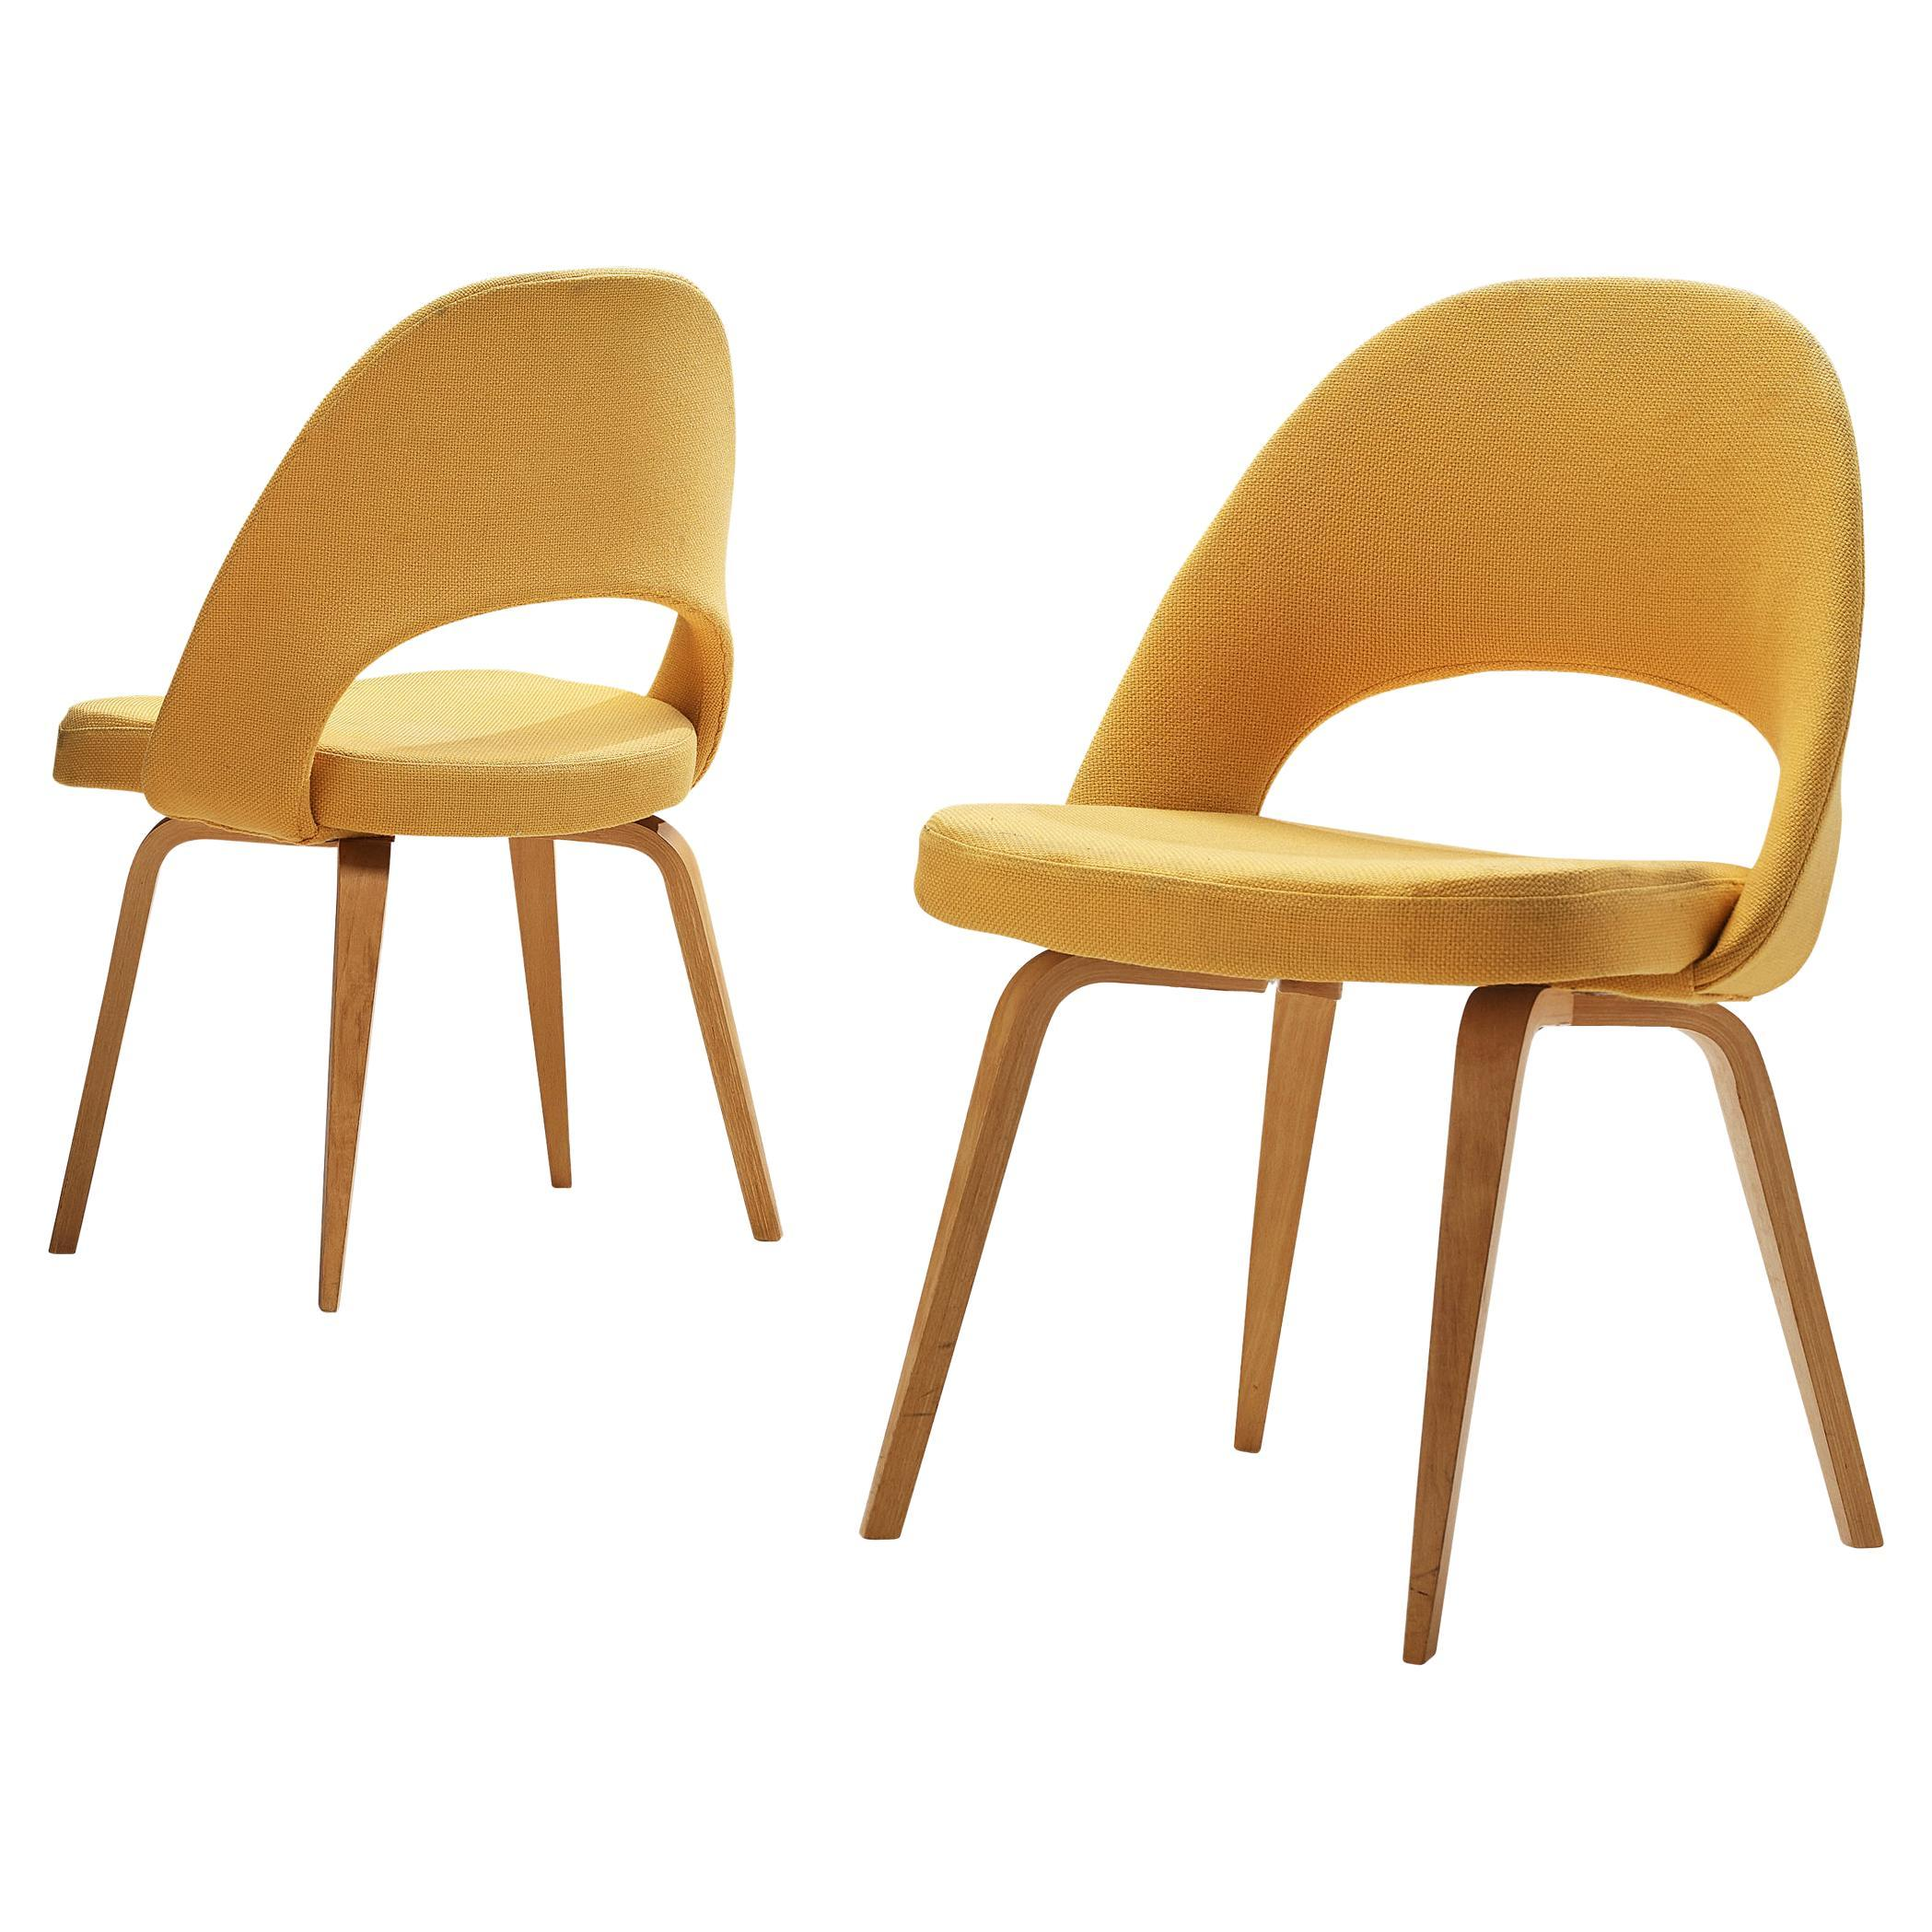 Pair of Eero Saarinen for Knoll International Dining Chairs